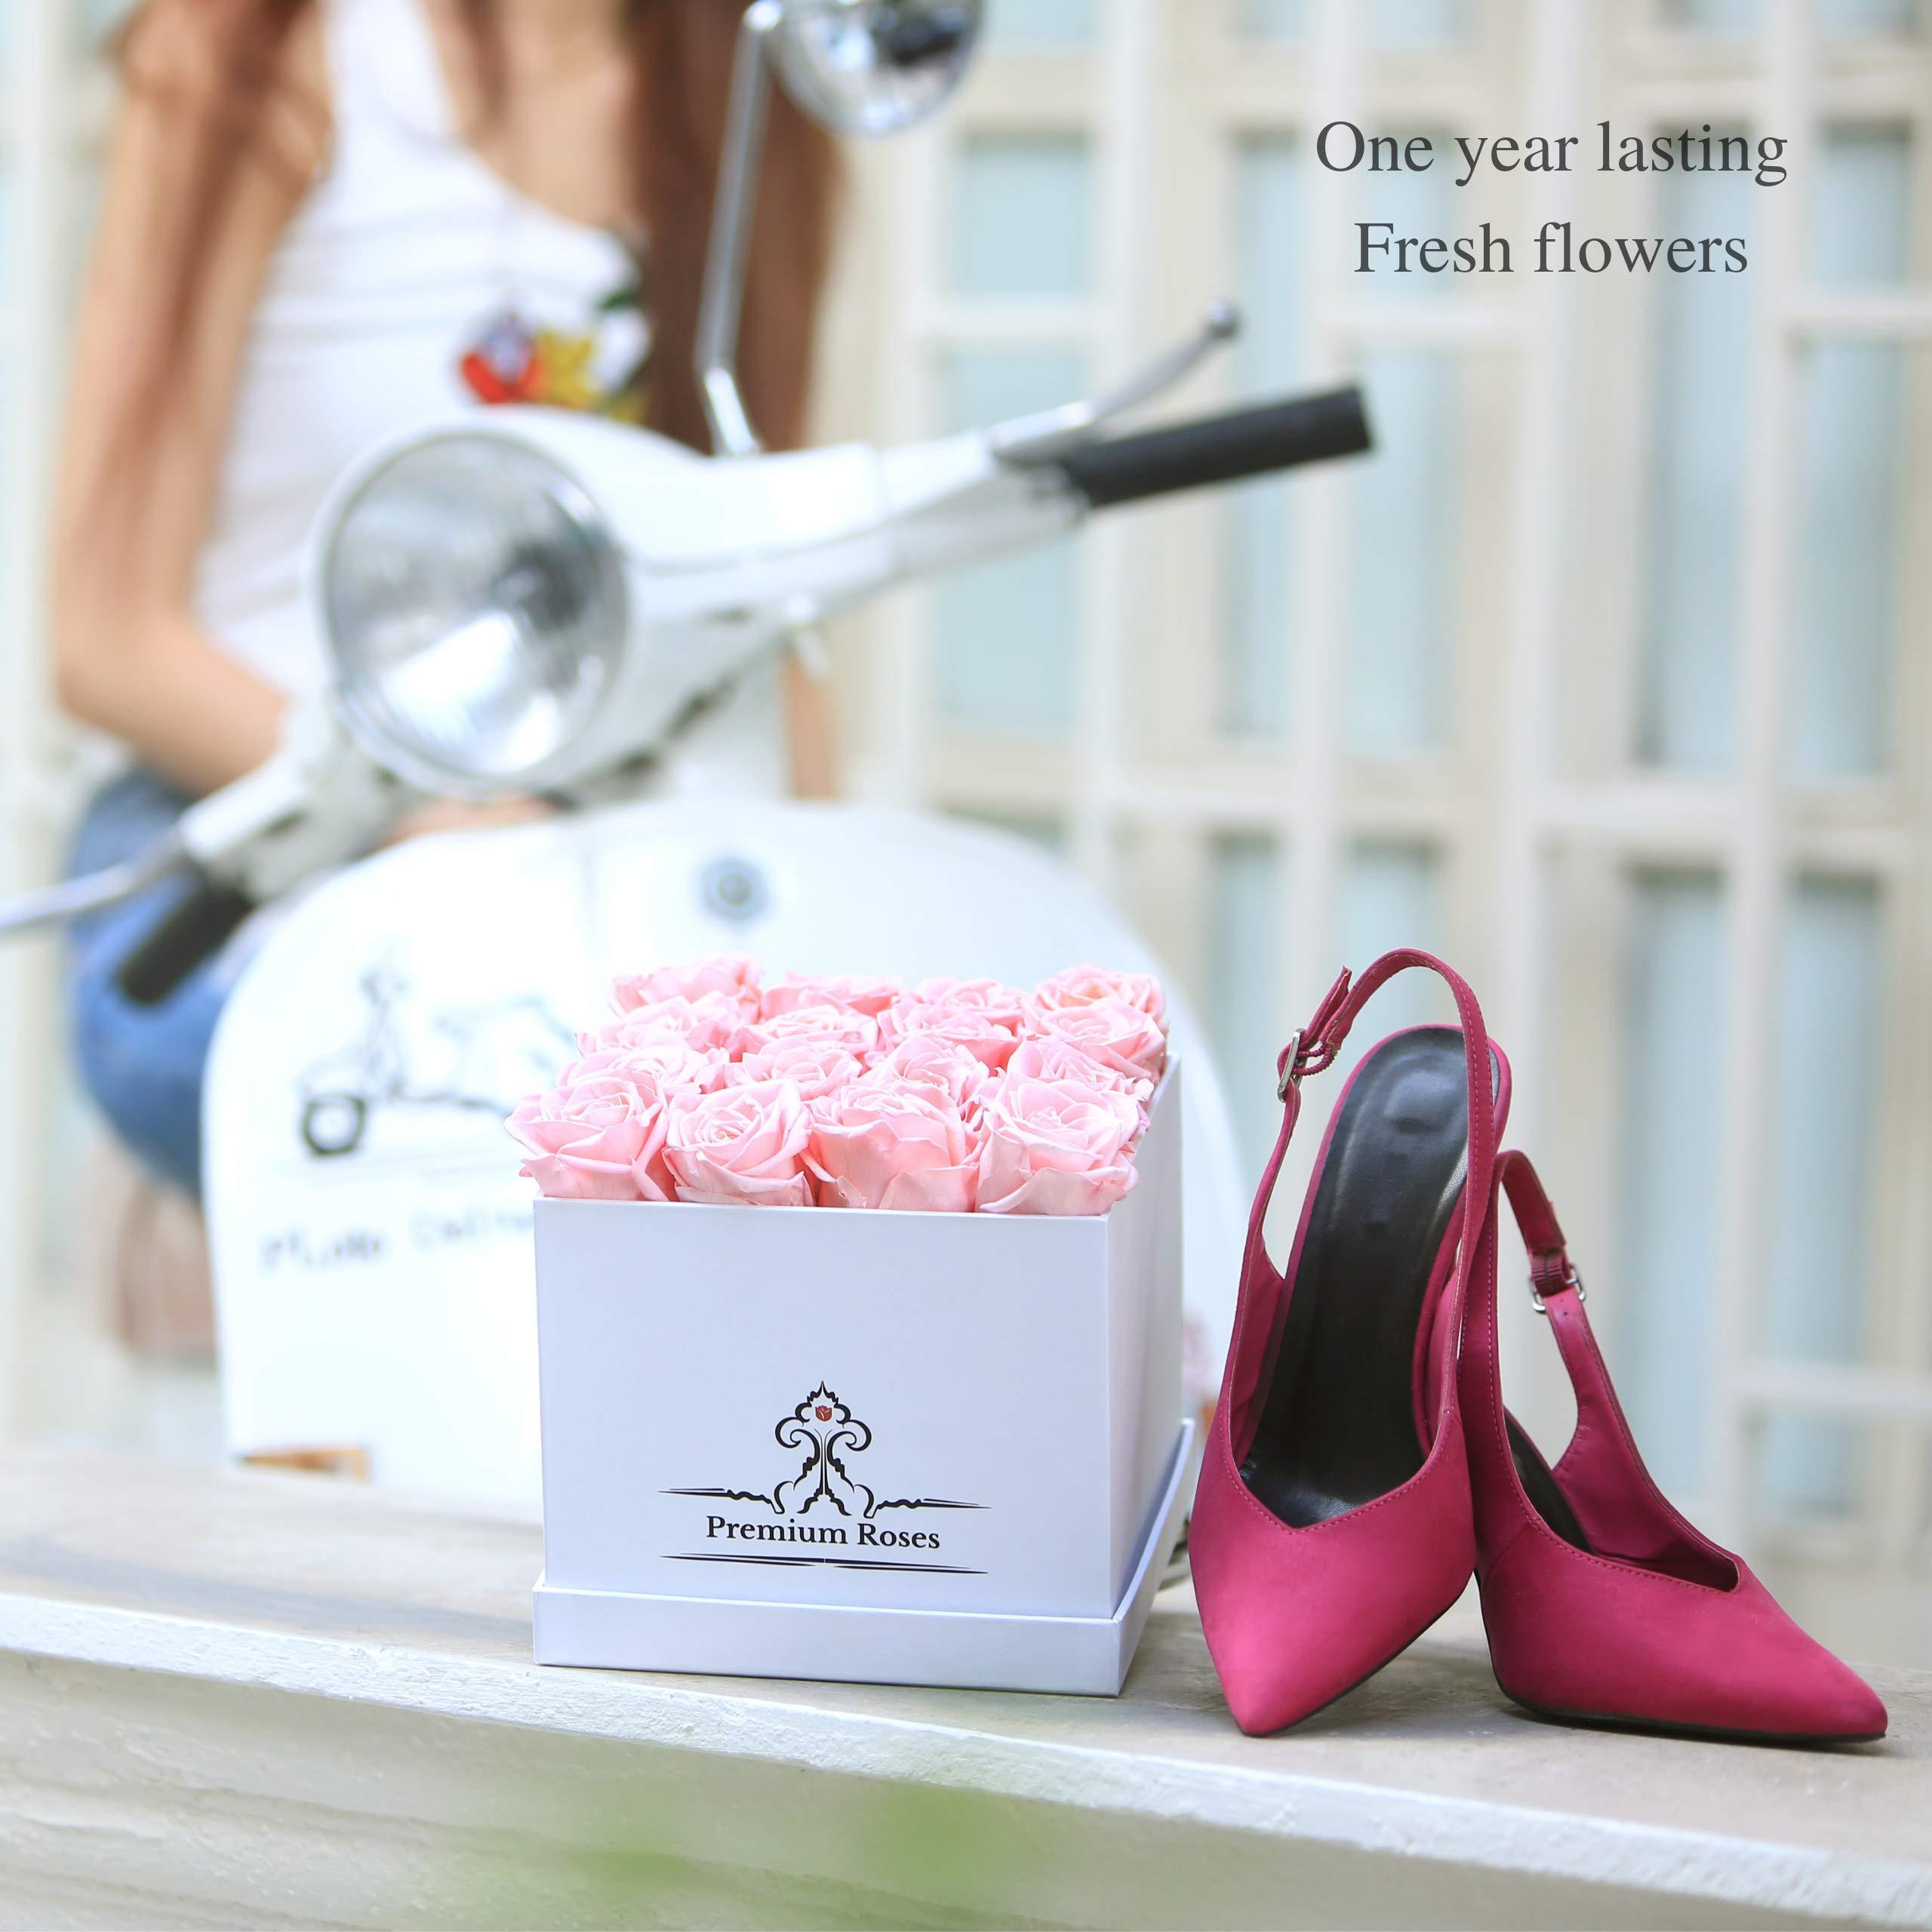 Premium Roses | Model White| Real Roses That Last 365 Days | Fresh Flowers| Roses in a Box (White Box, Medium) by Premium Roses (Image #3)